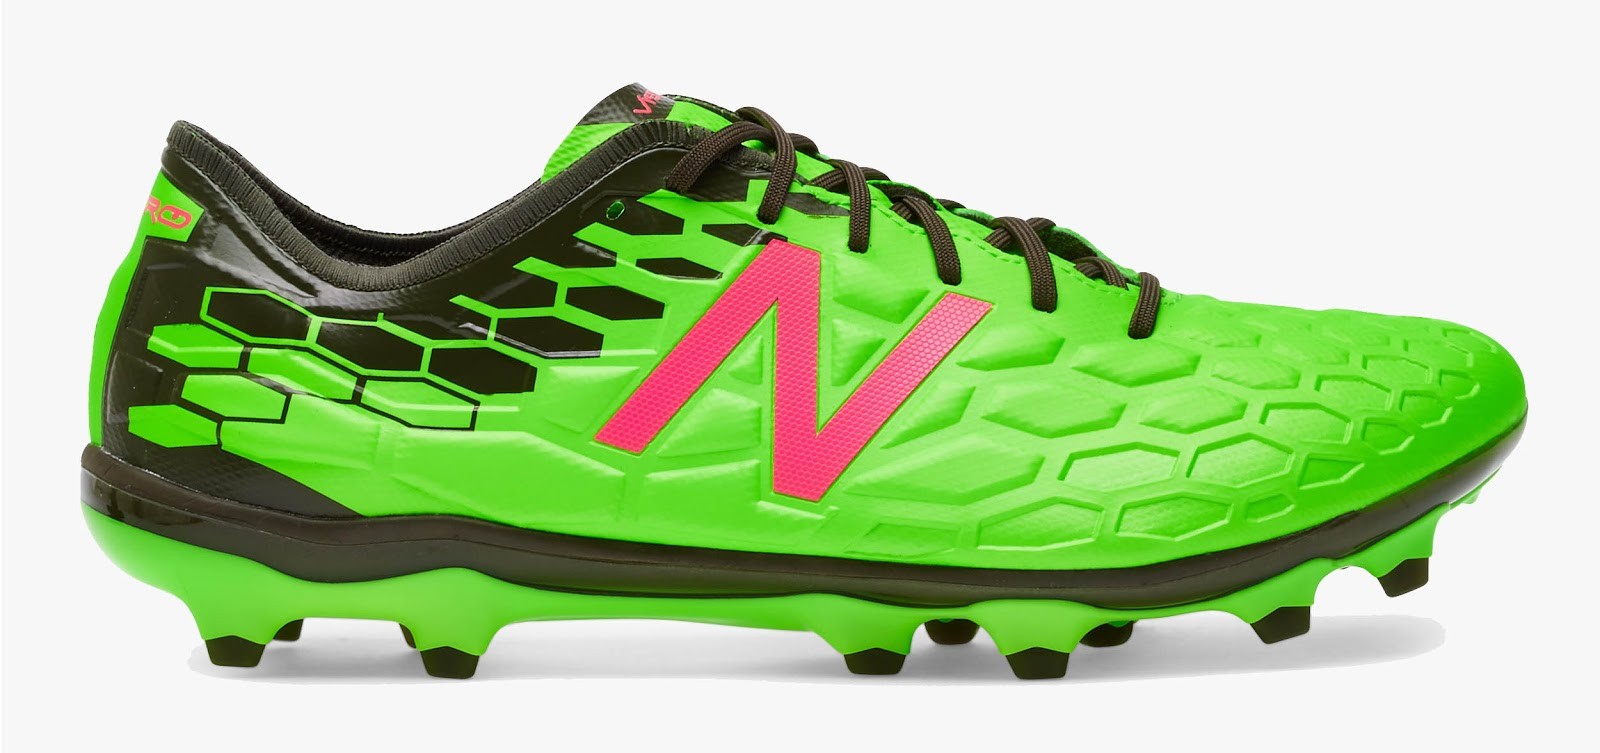 New Balance Visaro II Pro - Energy Lime / Alpha Pink / Black. This image  shows the boldest New Balance Visaro 2 football boots ...